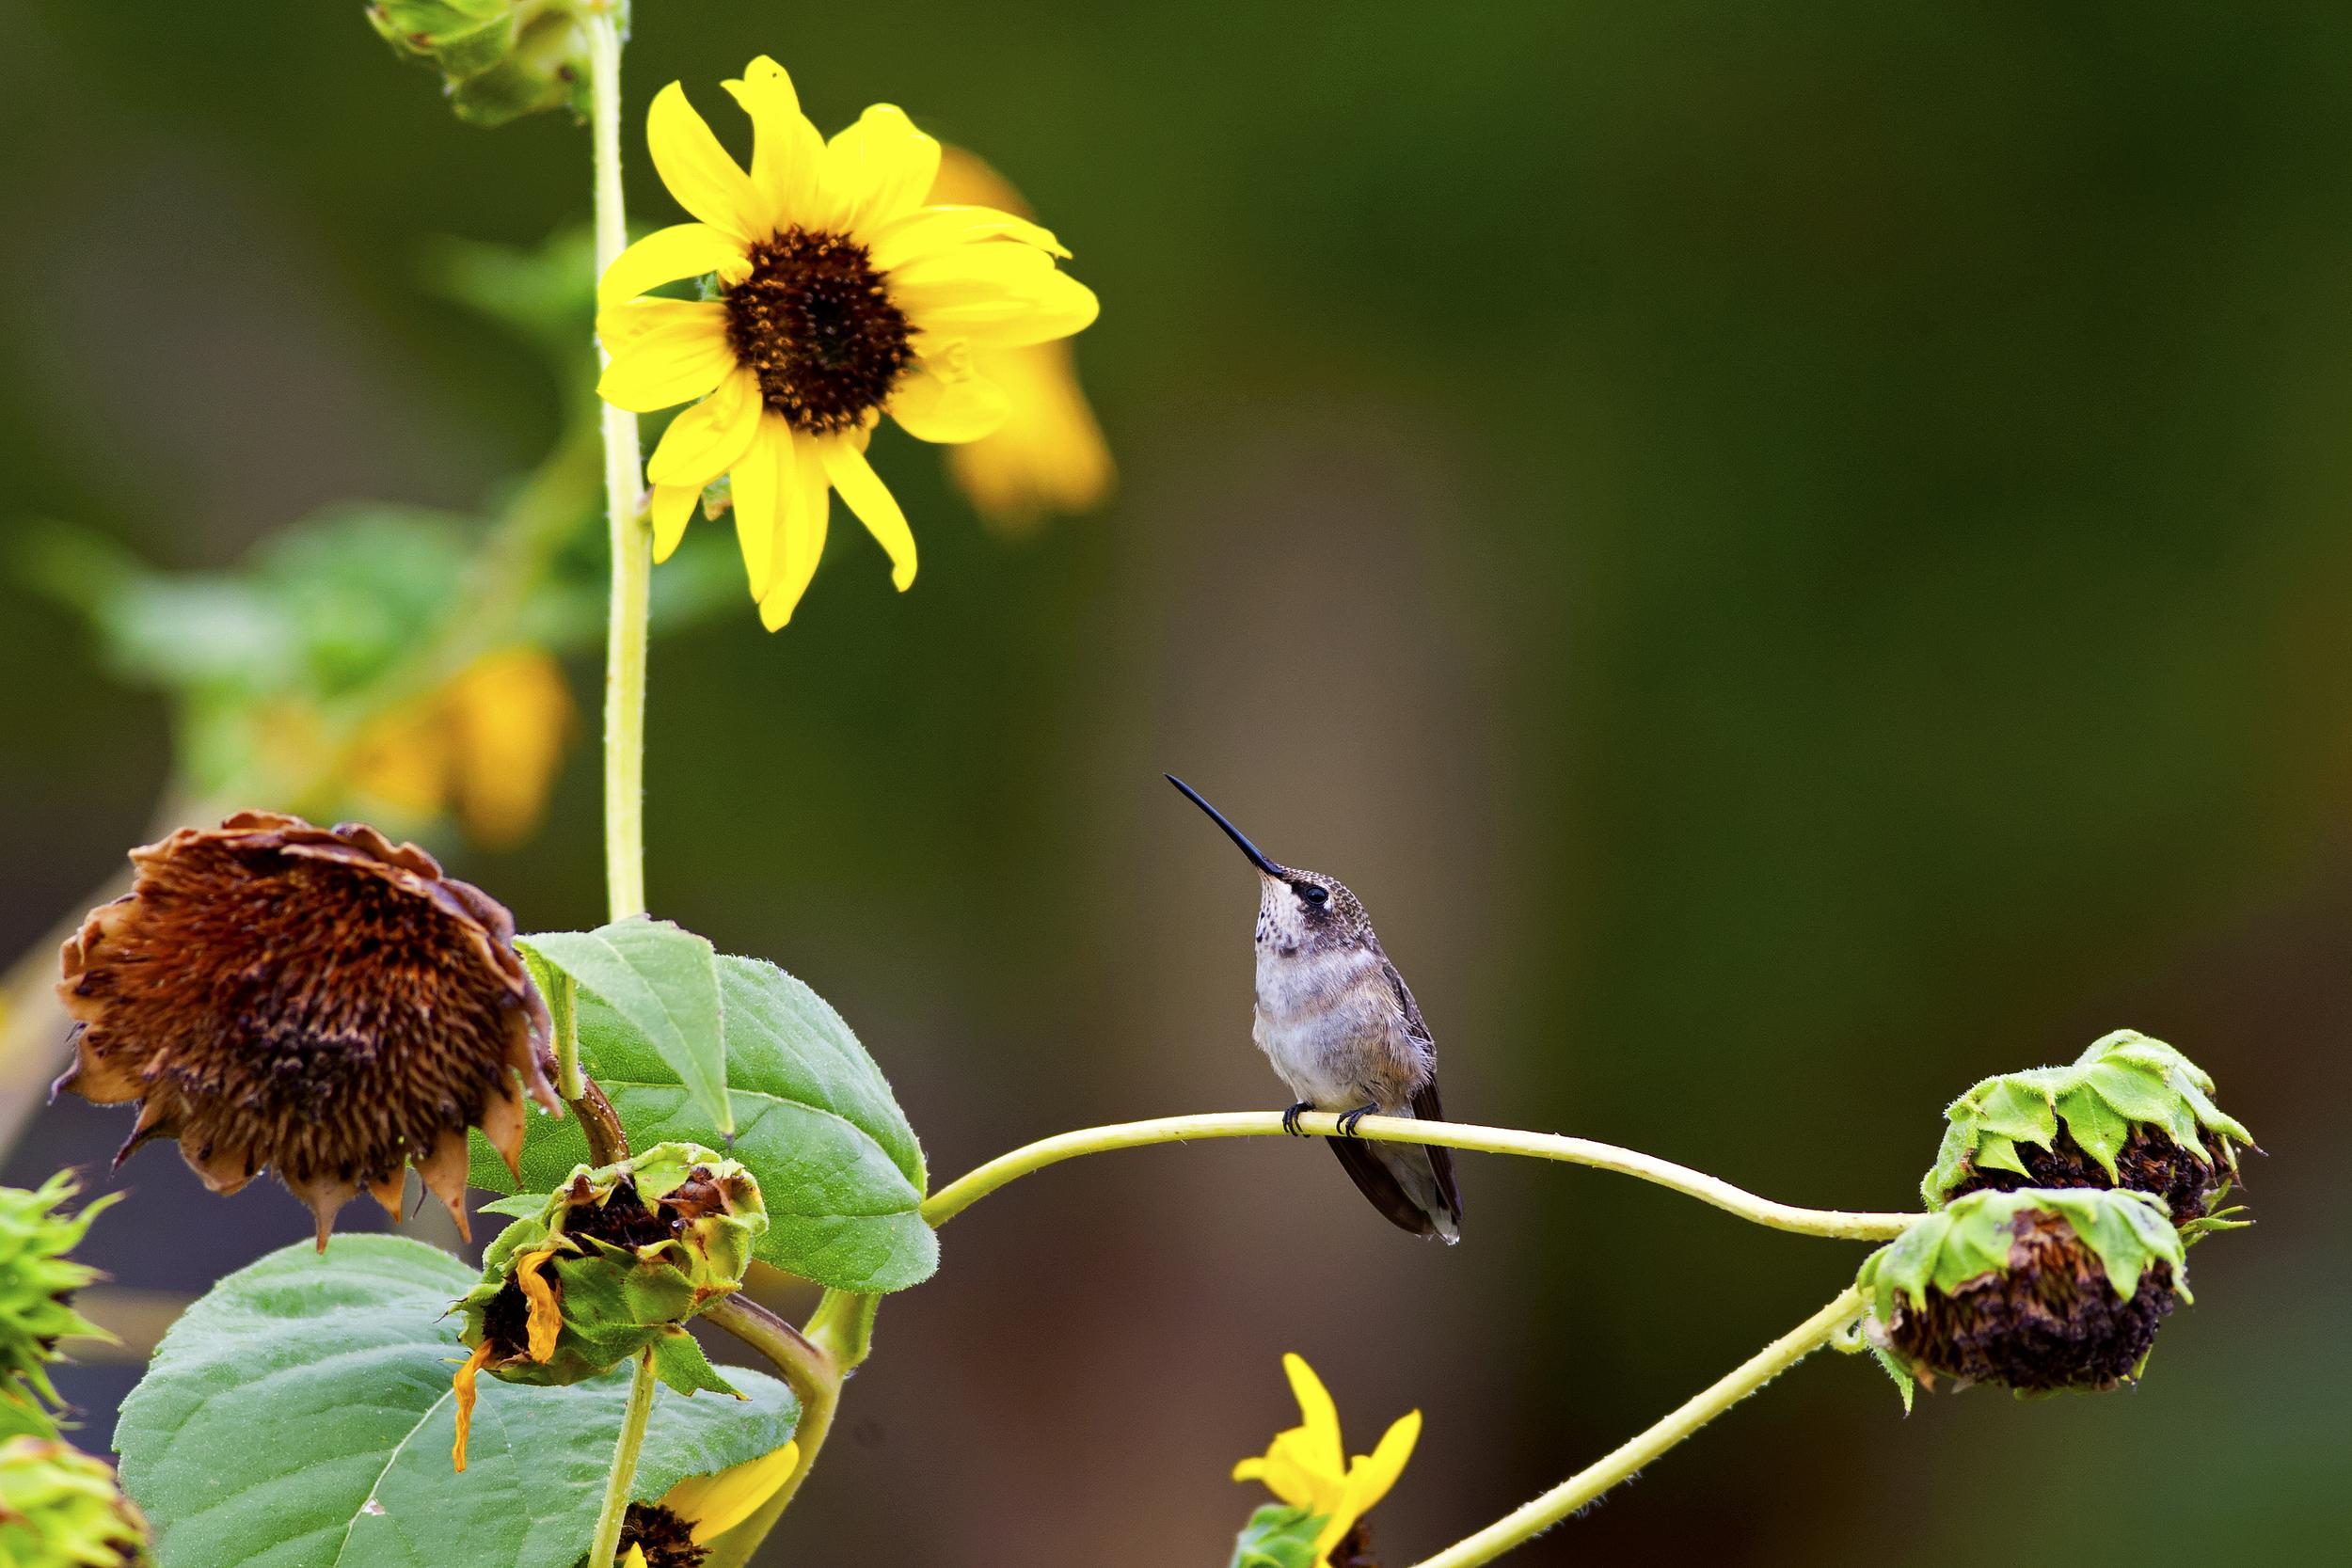 136 - Hummingbird